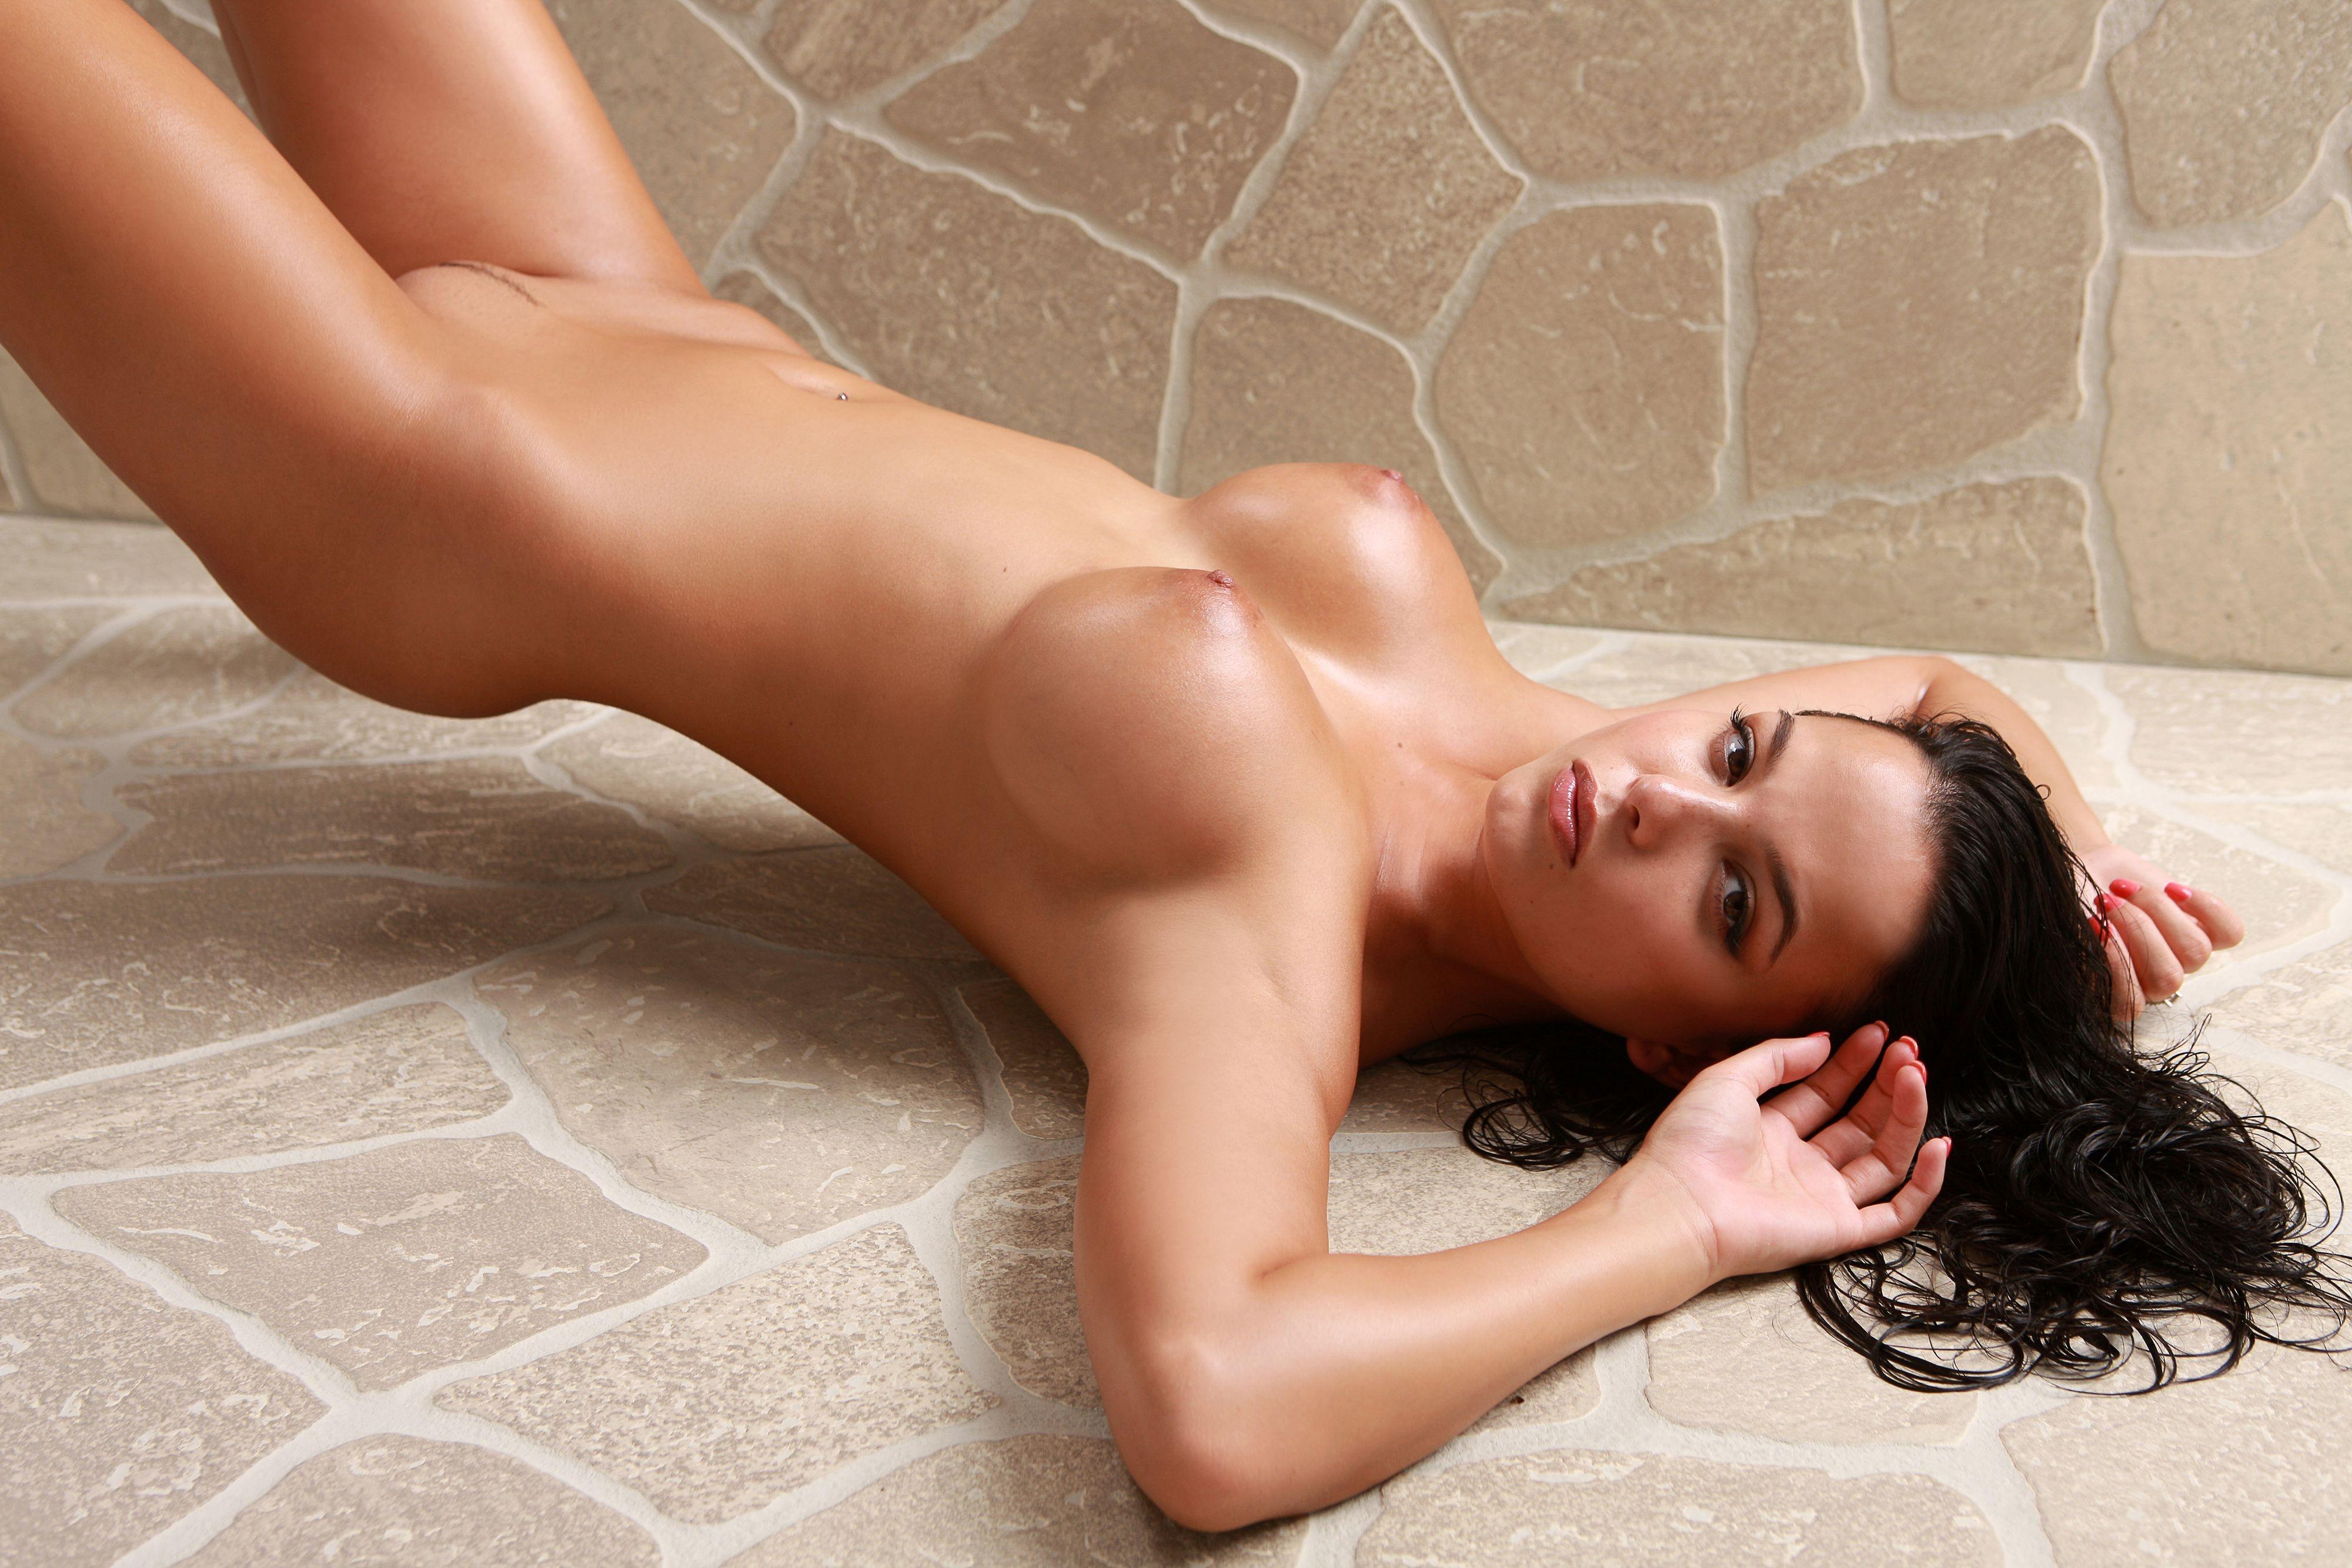 Rachel weisz naked bottom